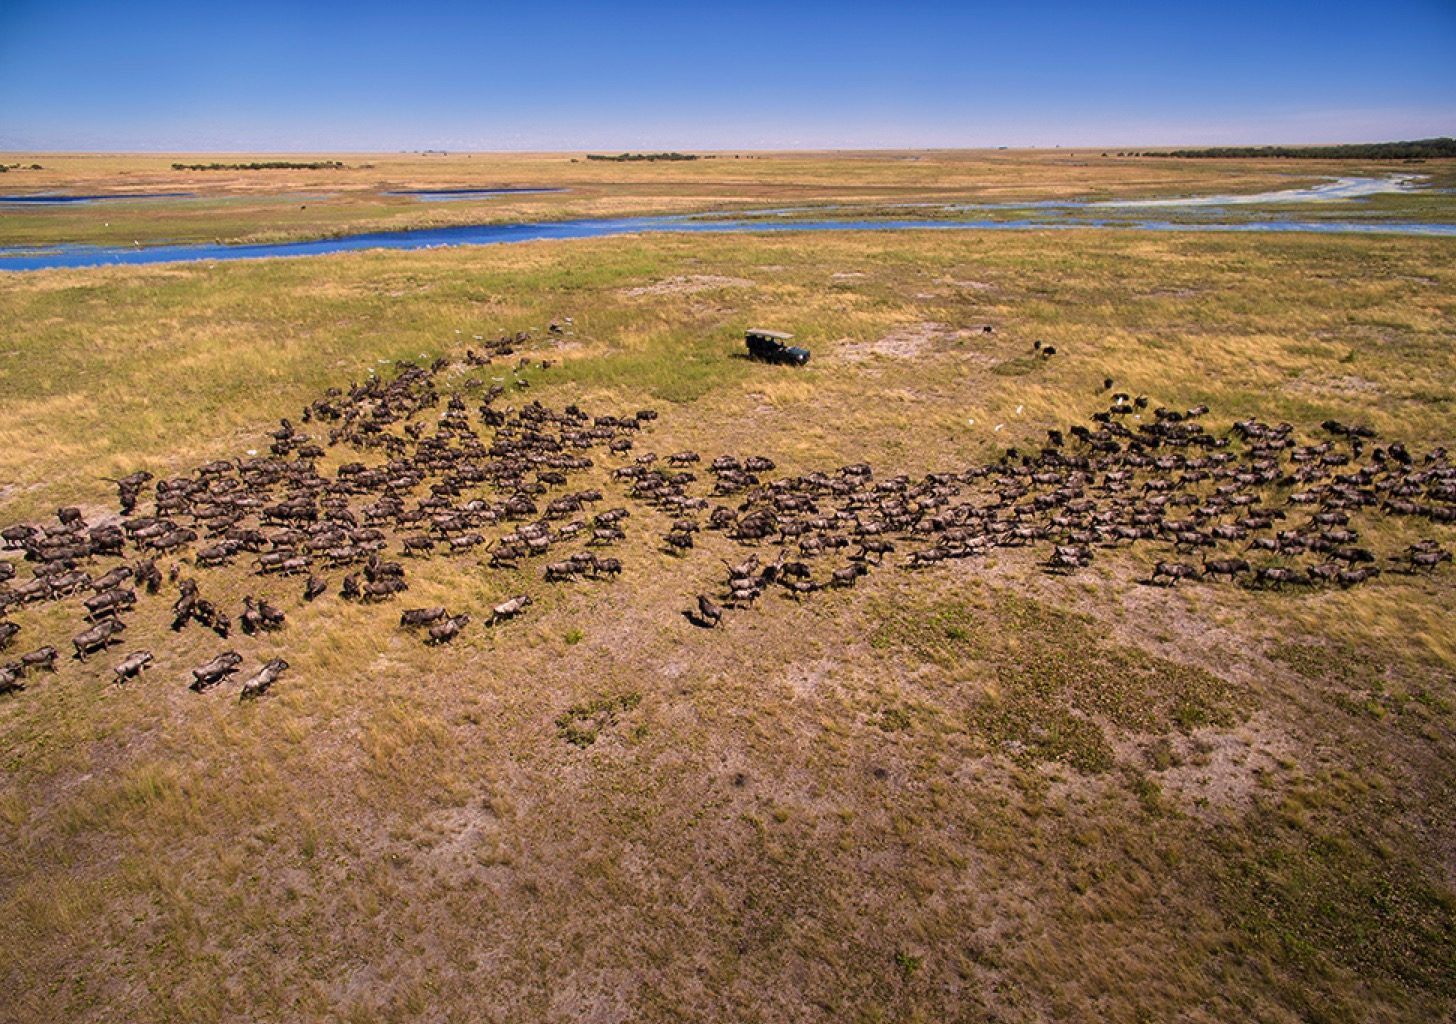 Liuwa Plain National Park Zambia Buffalo Aerial